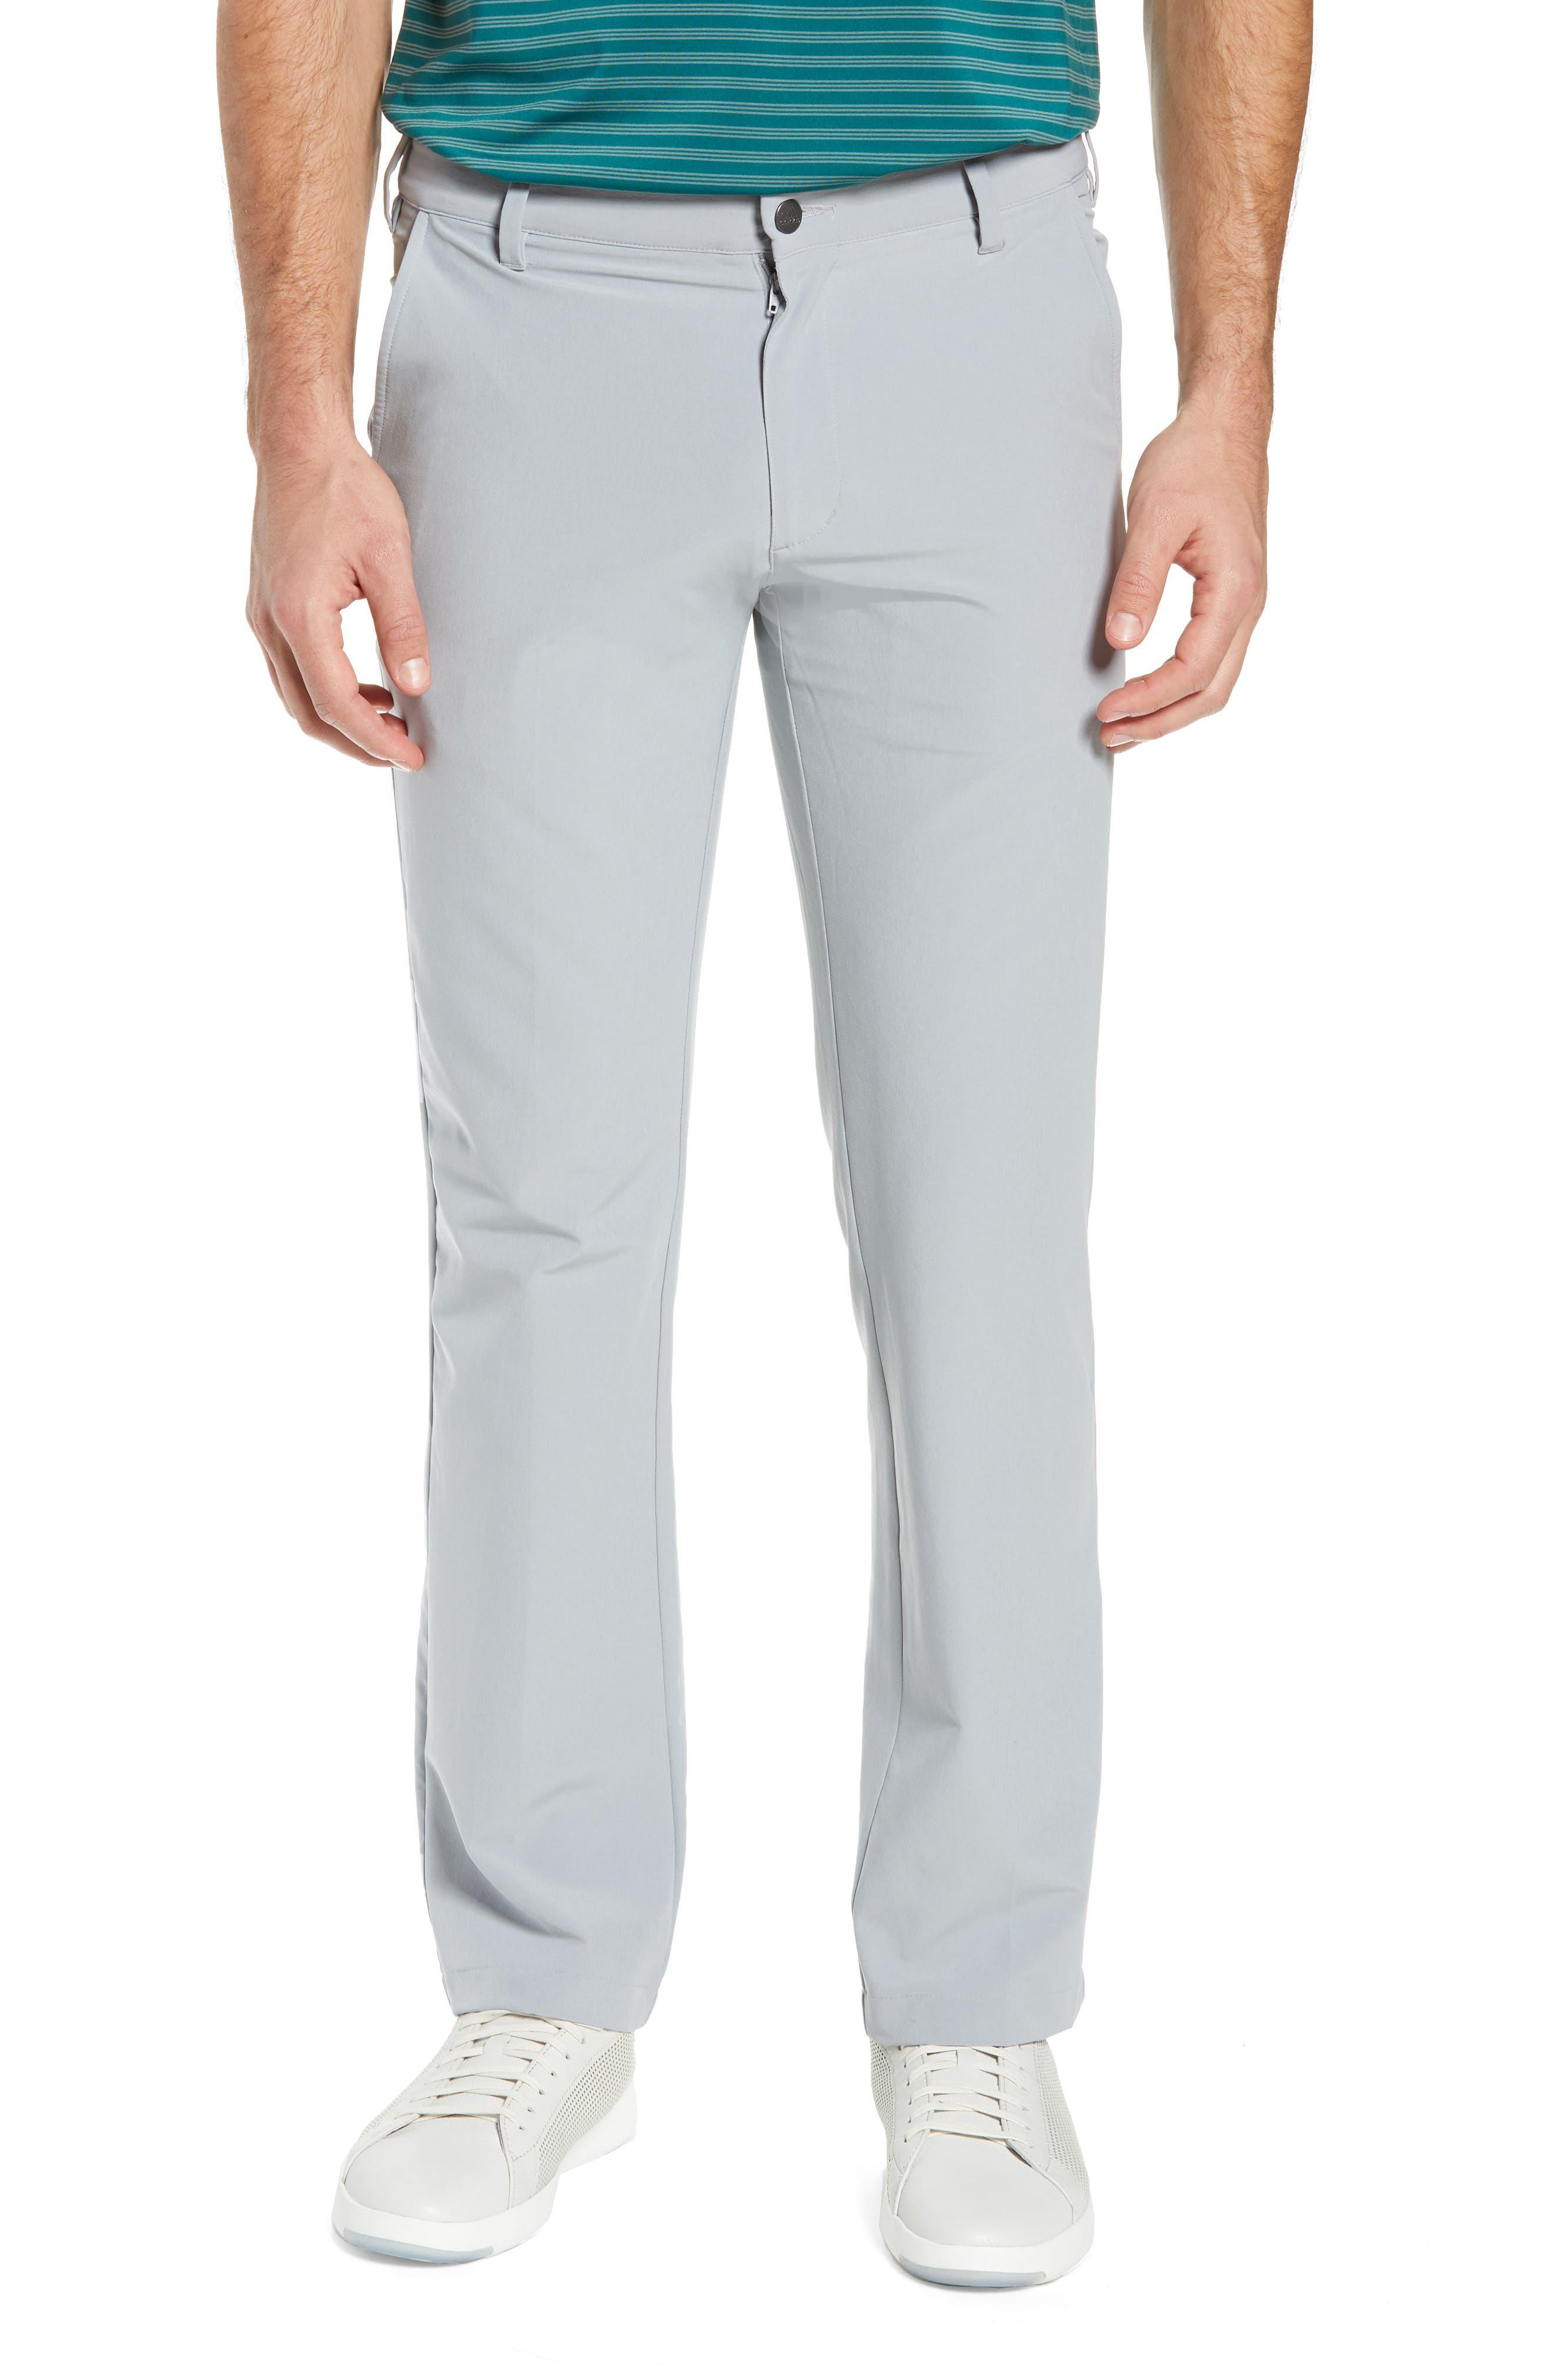 adidas Ultimate Regular Fit Golf Pants,                             Main thumbnail 1, color,                             085